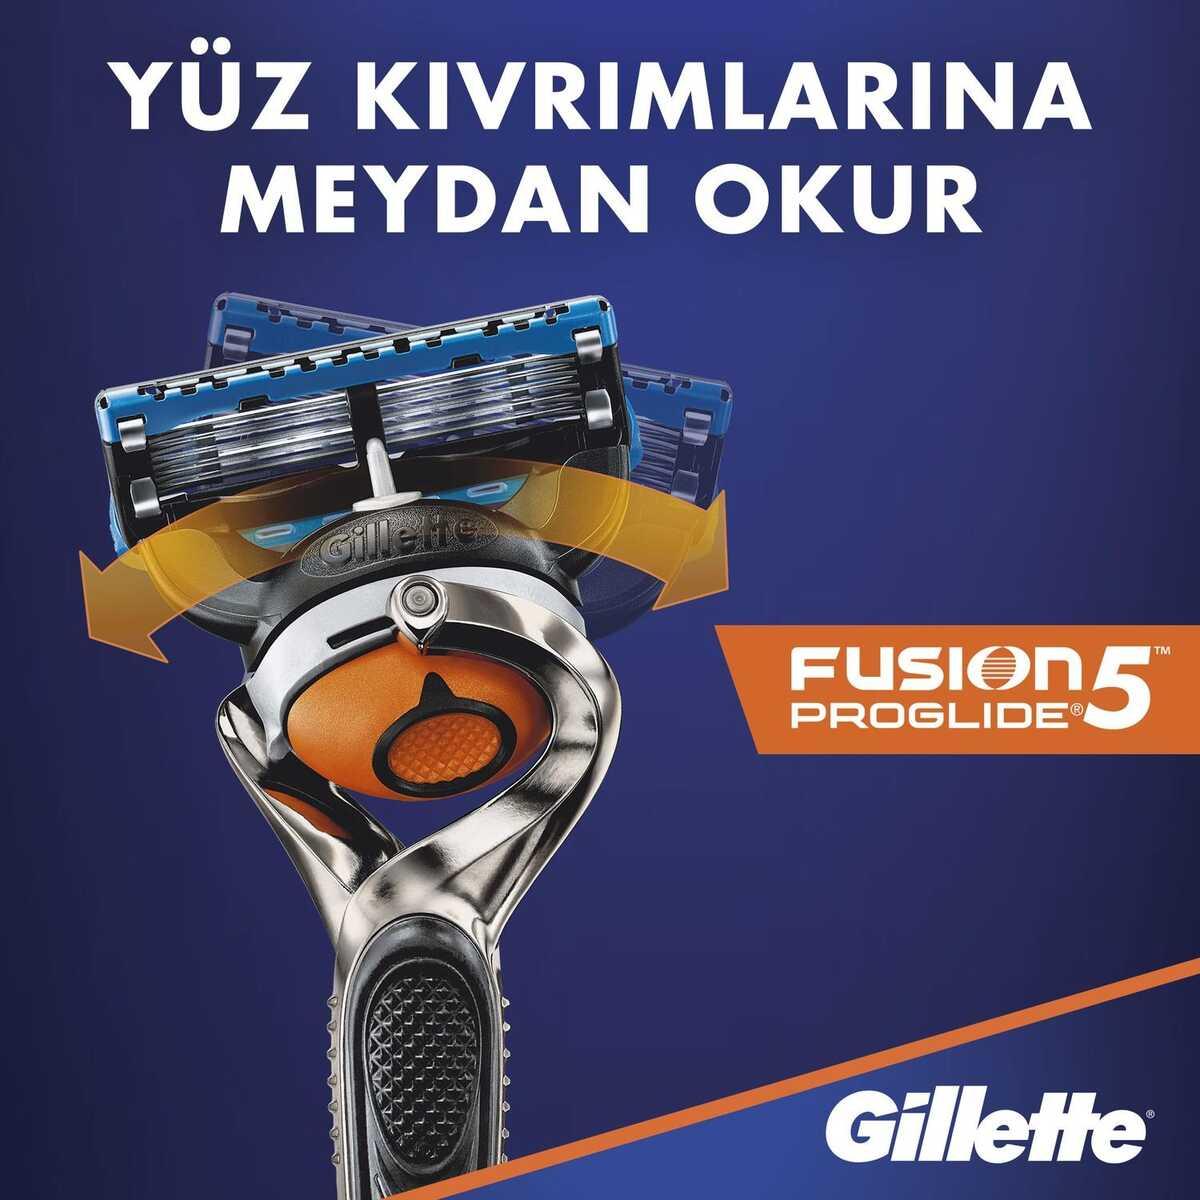 Fusion Proglide Power 8'li Bıçak